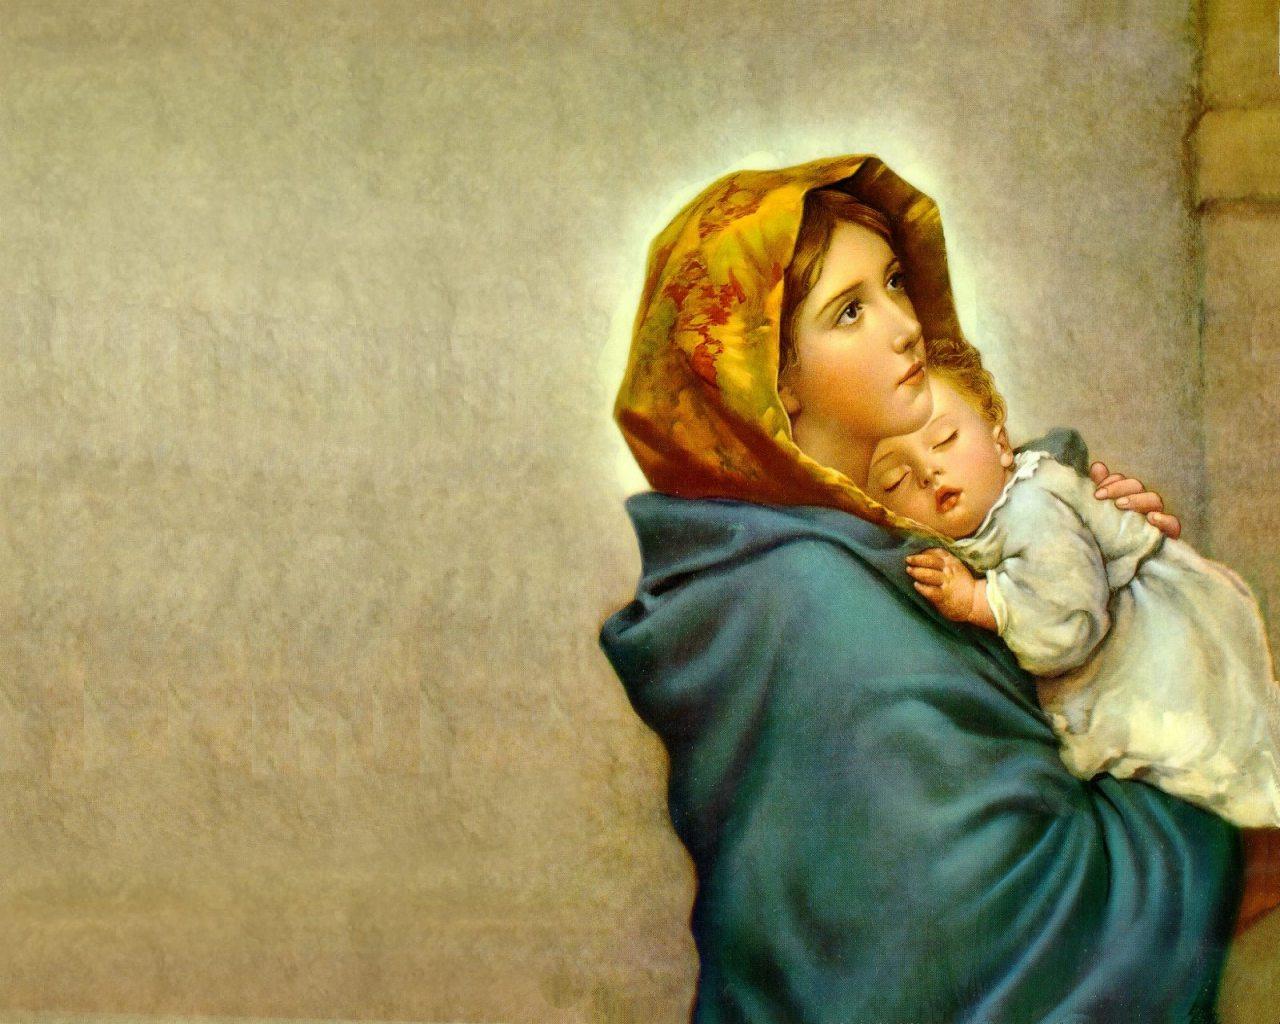 http://3.bp.blogspot.com/-AFyHB1maWxE/Th4WveV2ApI/AAAAAAAAAVg/2xhin3WuGtI/s1600/Blessed-Virgin-Mary-Madonna-of-the-streets.jpg